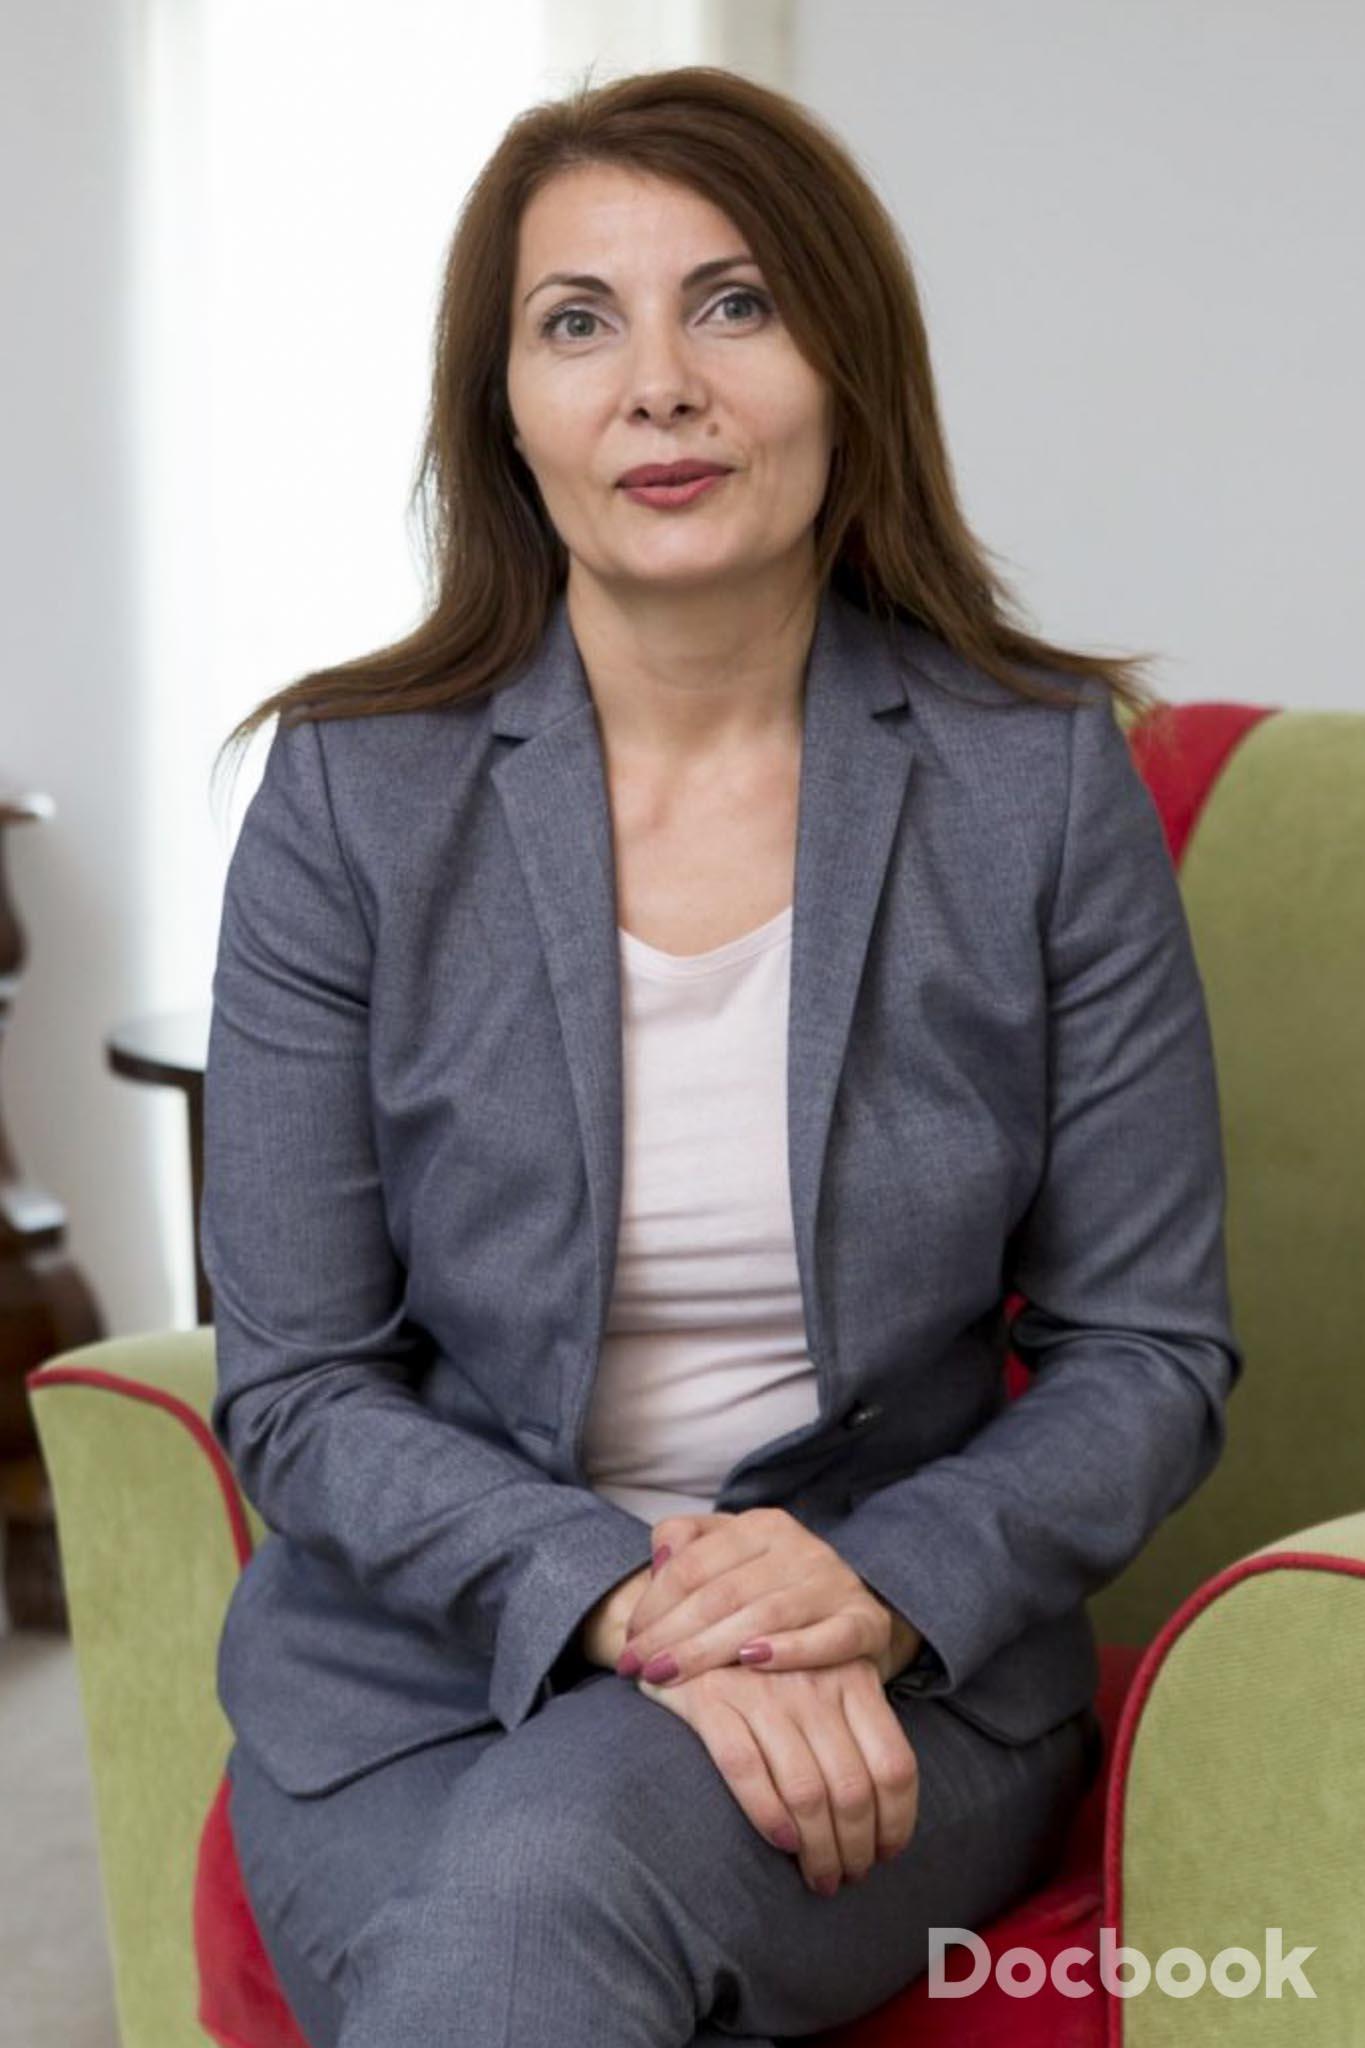 Dr. Ana Dumitrascu